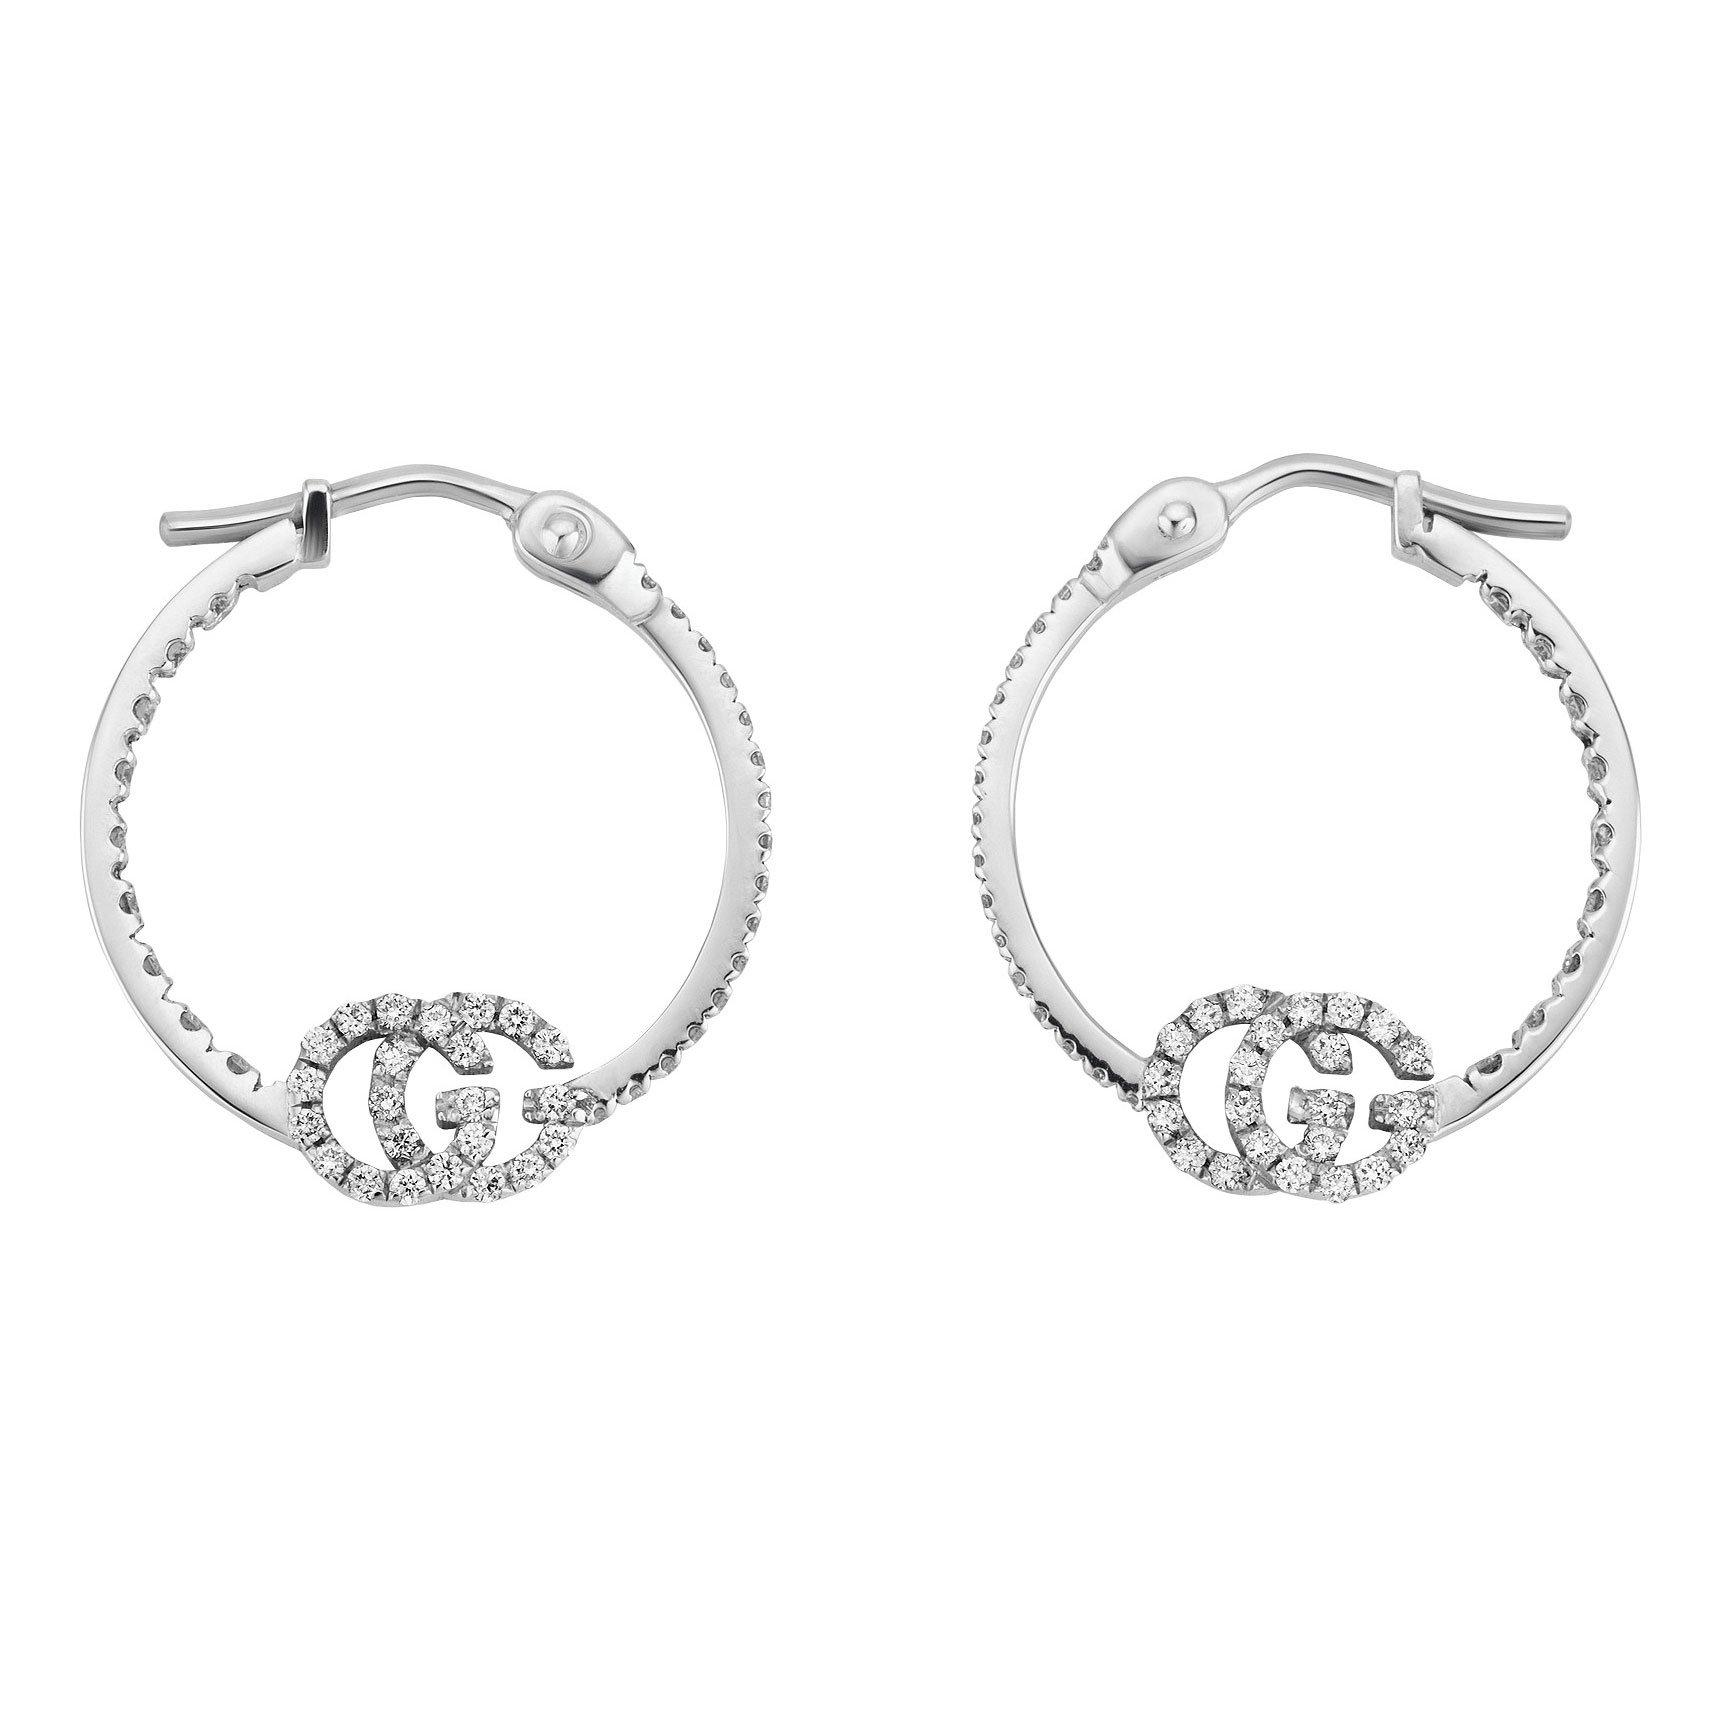 Gucci GG Running 18ct White Gold Diamond Hoop Earrings